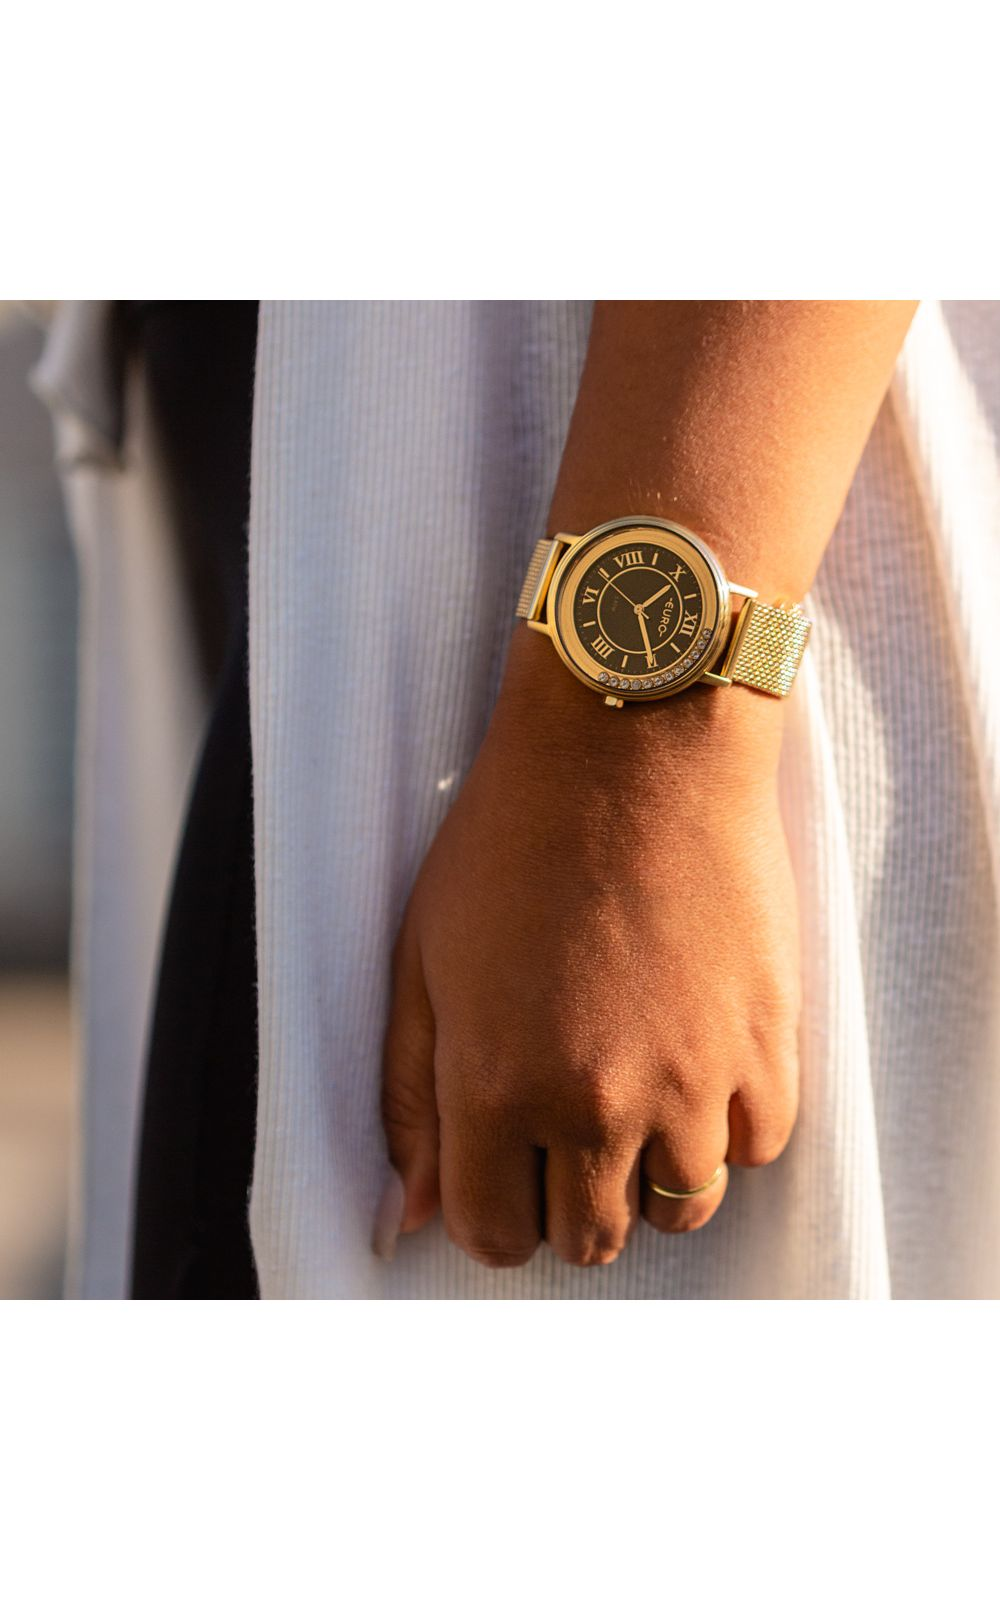 Foto 4 - Relógio Euro Crystal Move Feminino Dourado EU2035YRU/4P